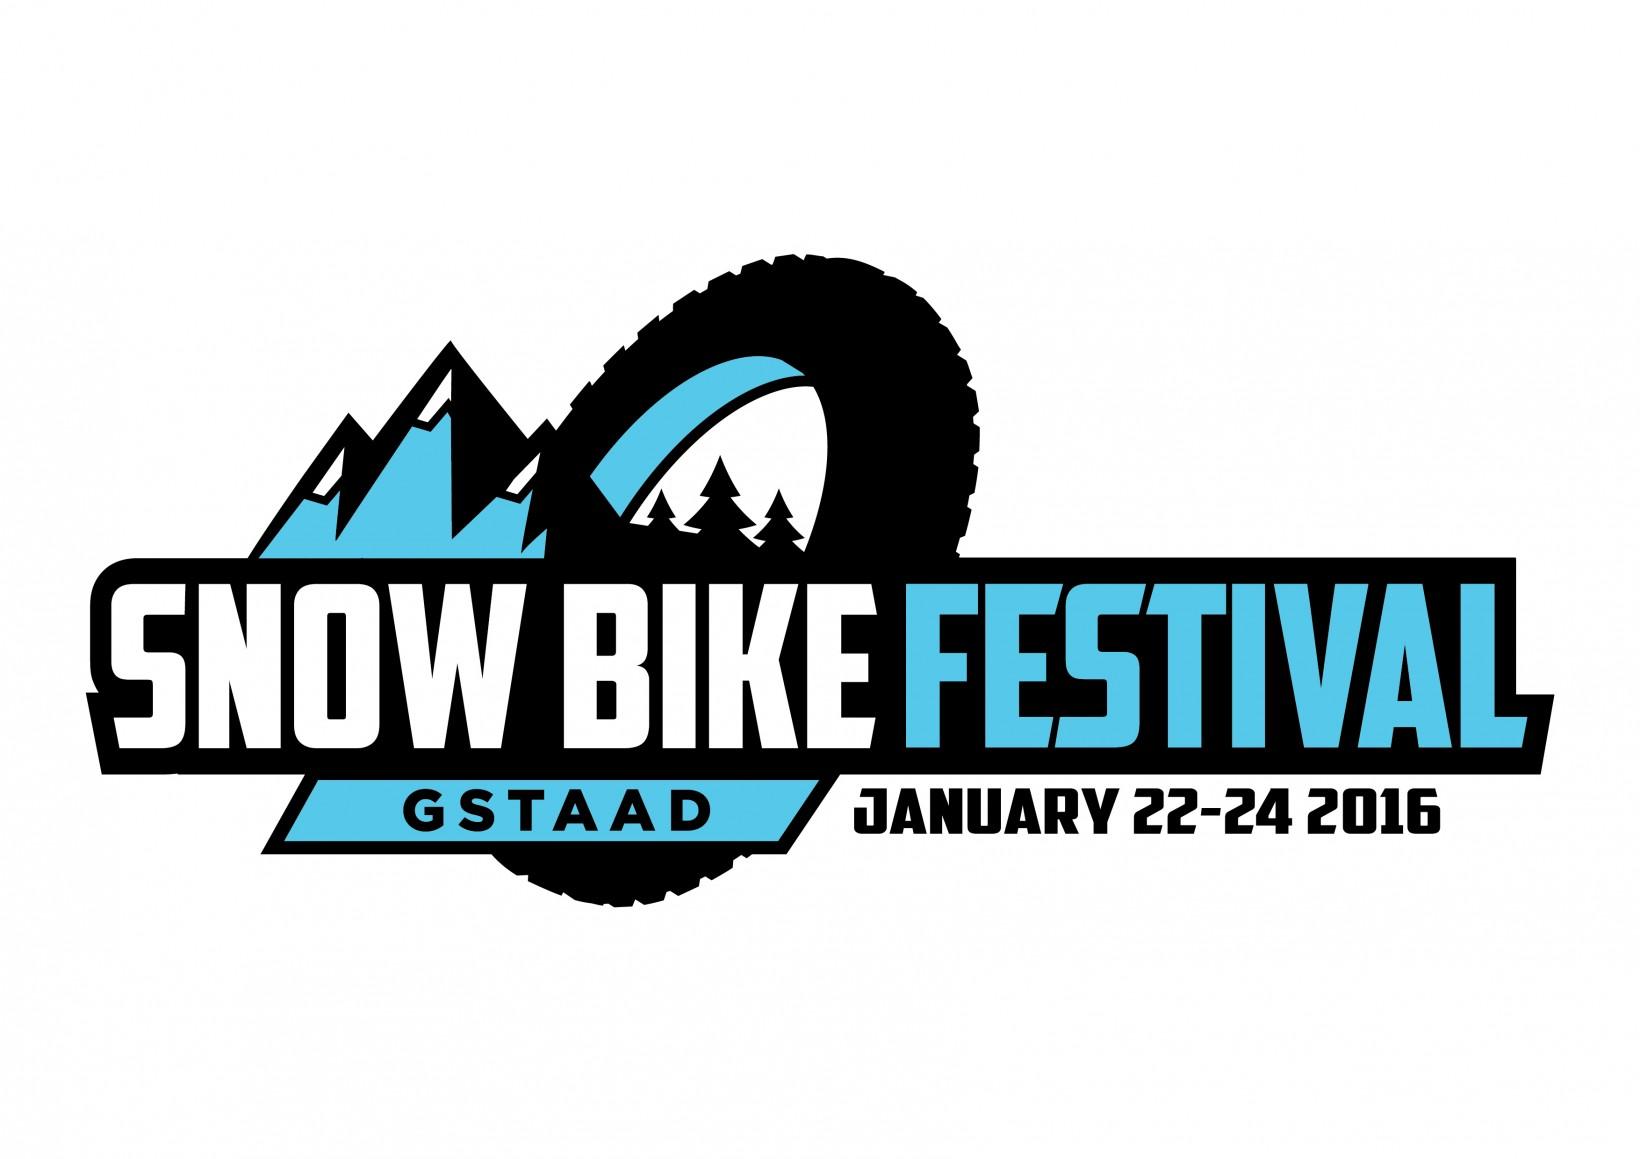 SnowBikeFestival_Logo-01